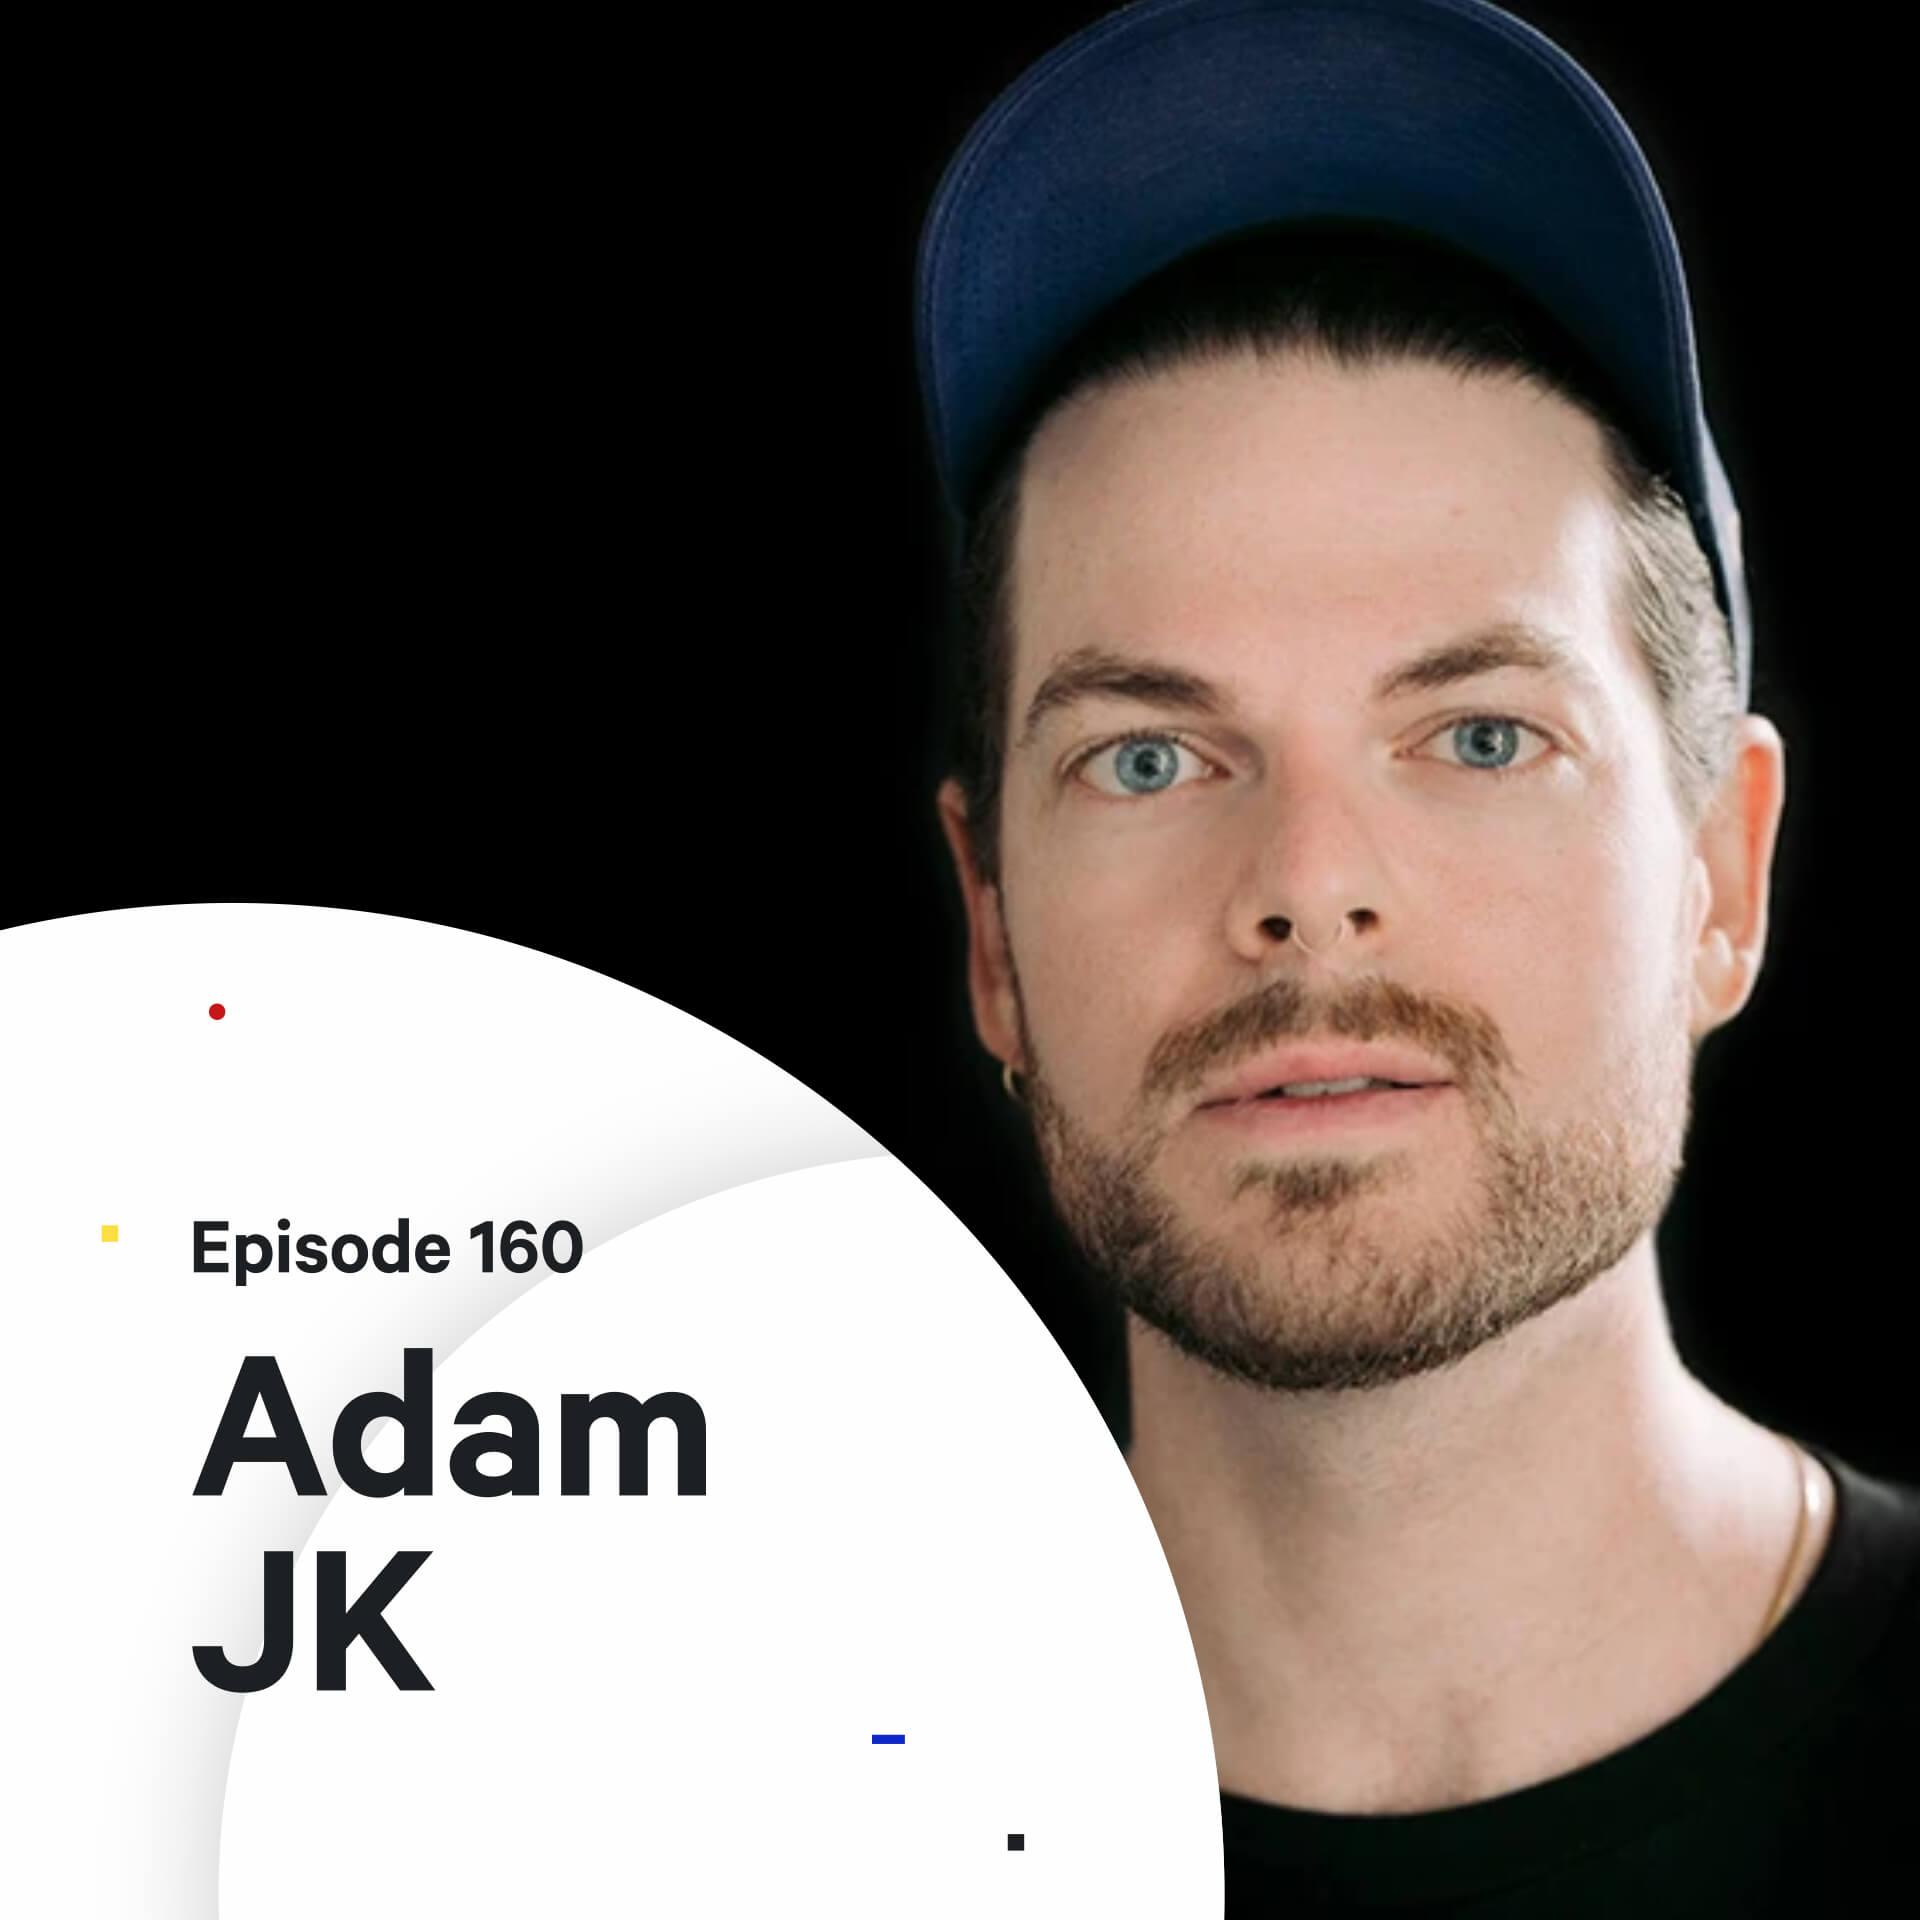 Adam JK